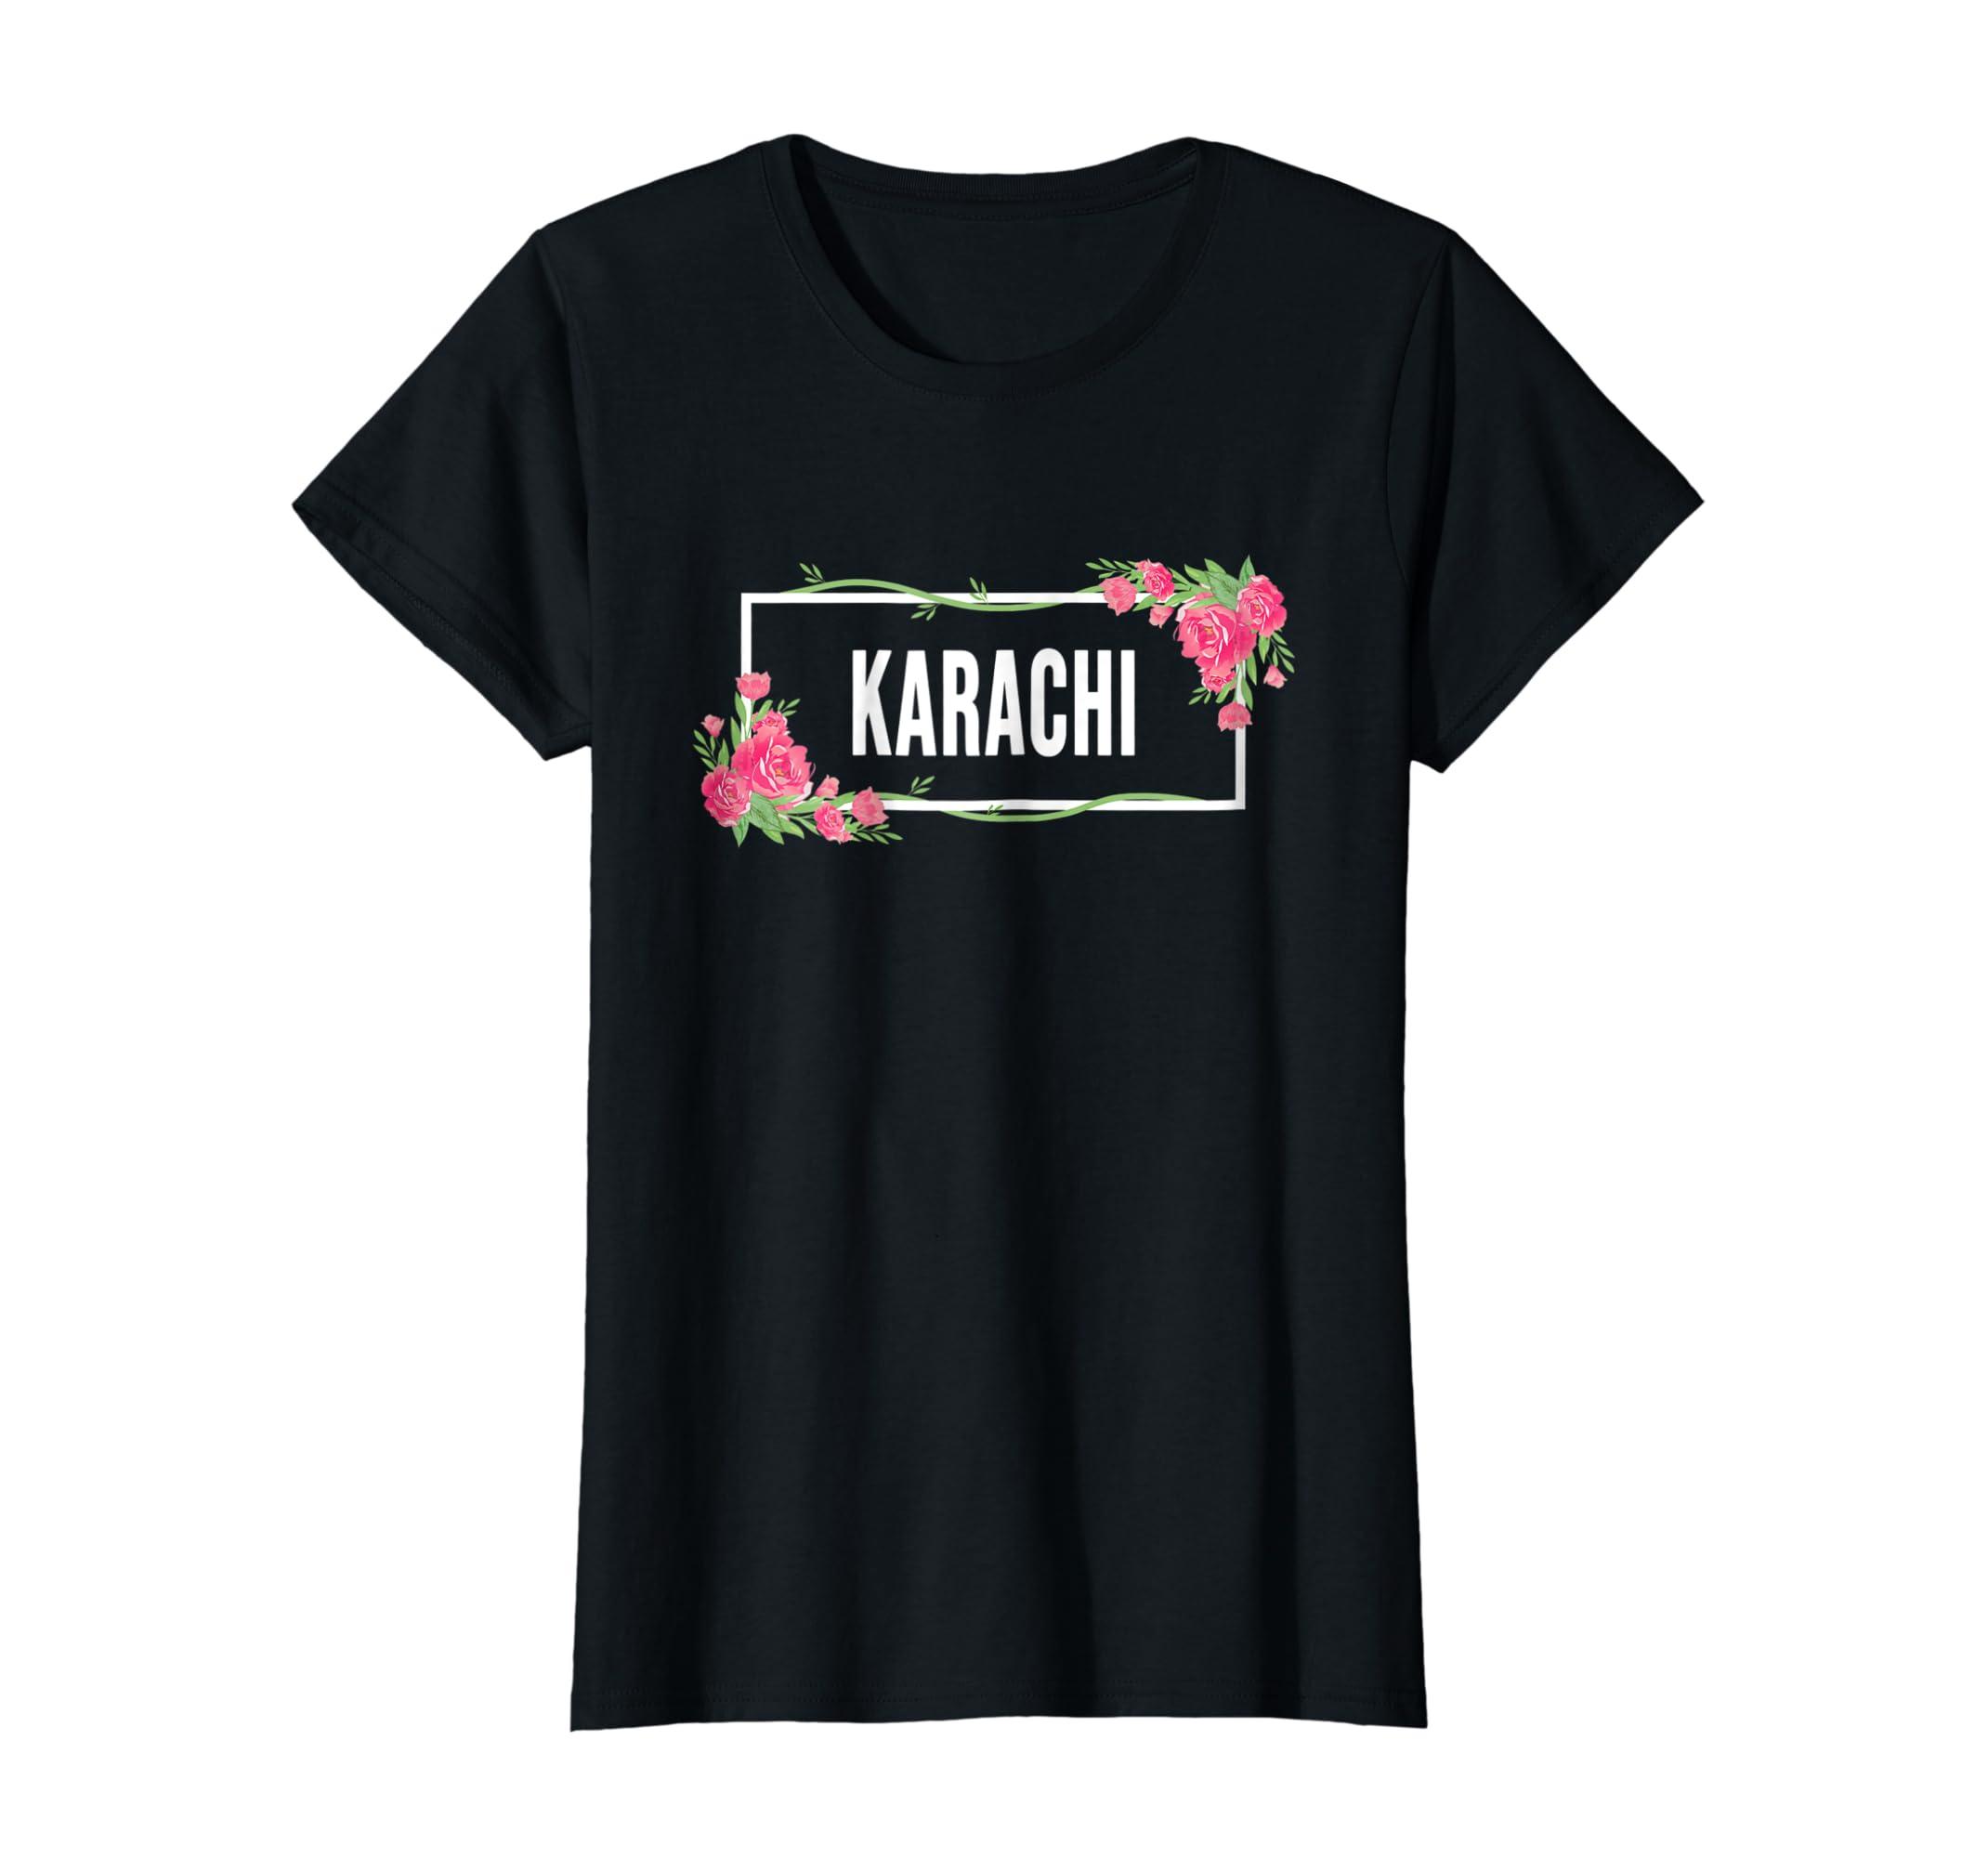 Amazoncom Karachi Pakistan T Shirt Floral Hibiscus Flower Clothing